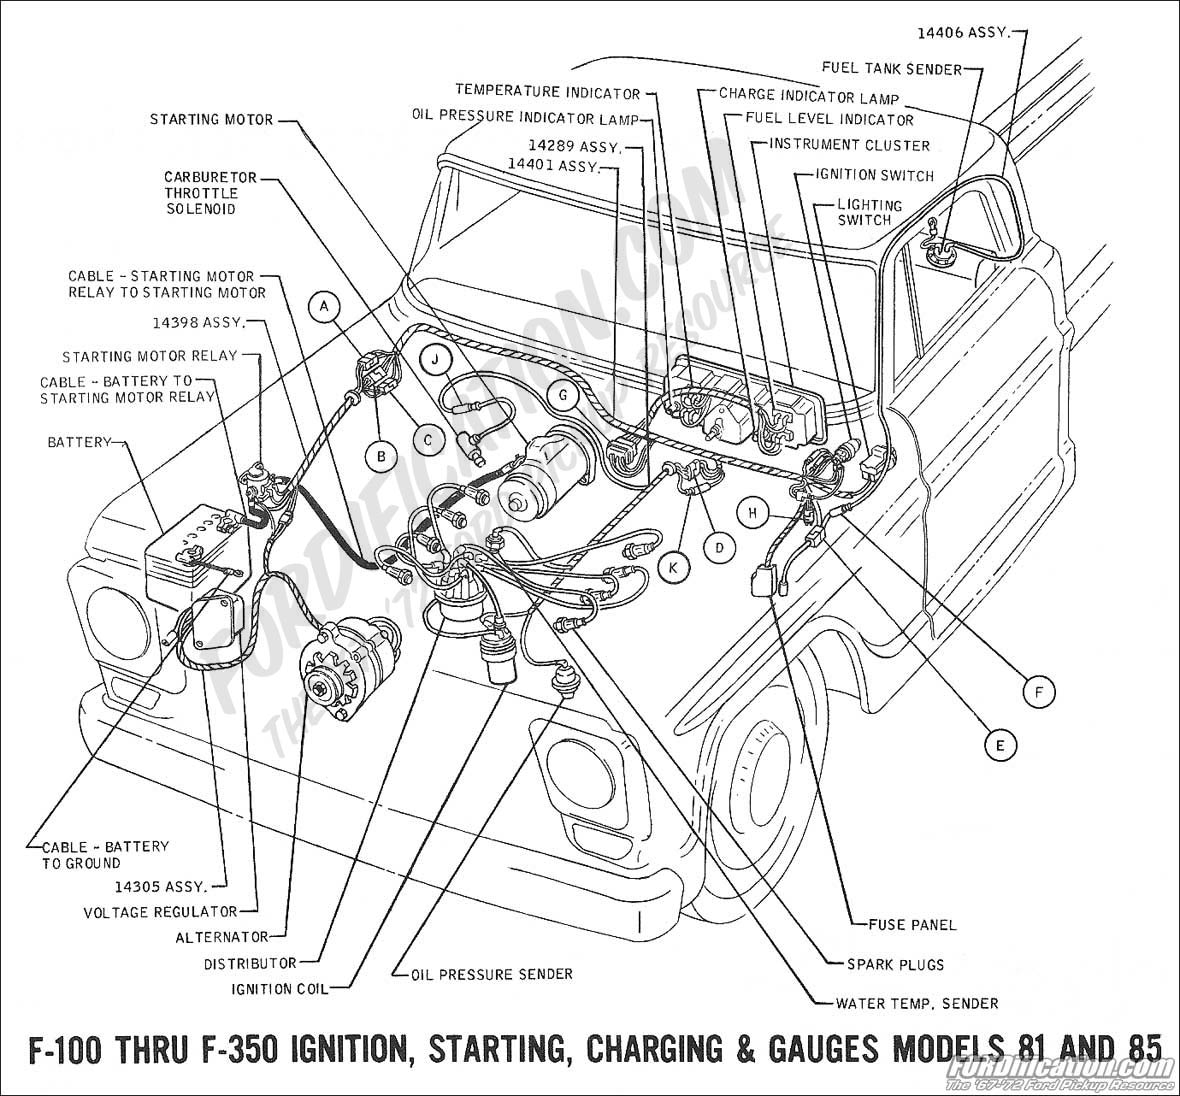 95 Buick Skylark Fuse Box Diagram furthermore 95 Riviera Fuse Box Diagram moreover 1964 Buick Skylark Fuse Box Diagram moreover 1963 Buick Riviera Wiring Diagram 1960 Ford Thunderbird Exhaust Cars99 Photos together with Ford Power Seat Wiring Diagram Wirning Diagrams. on 1964 buick riviera wiring diagram